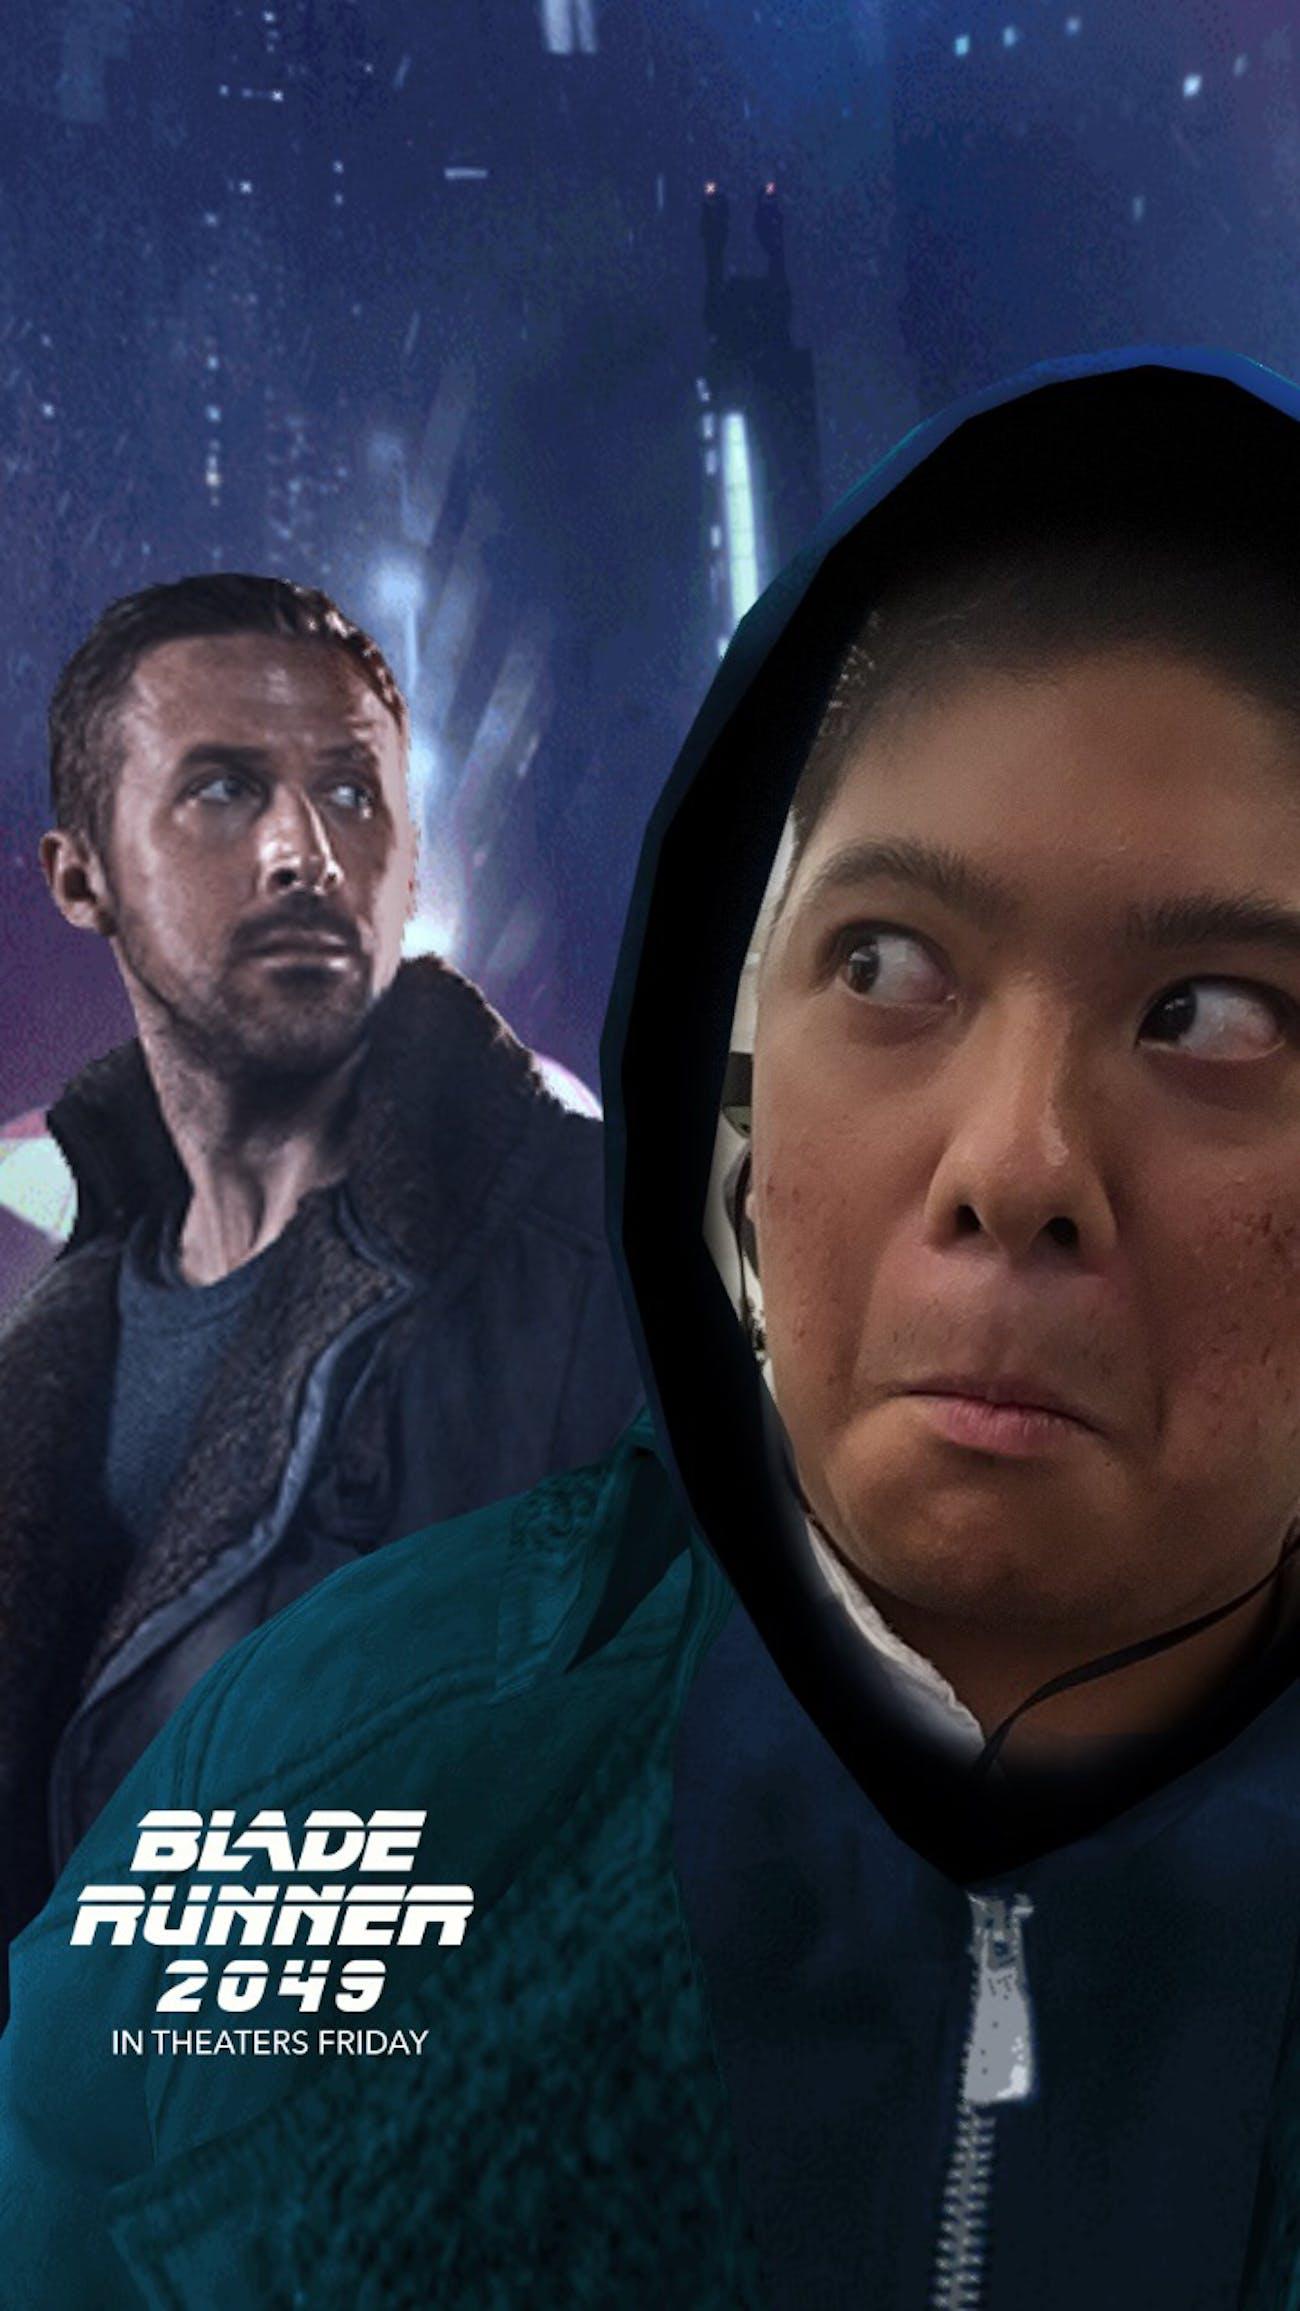 Ryan Gosling Blade Runner Snapchat filter